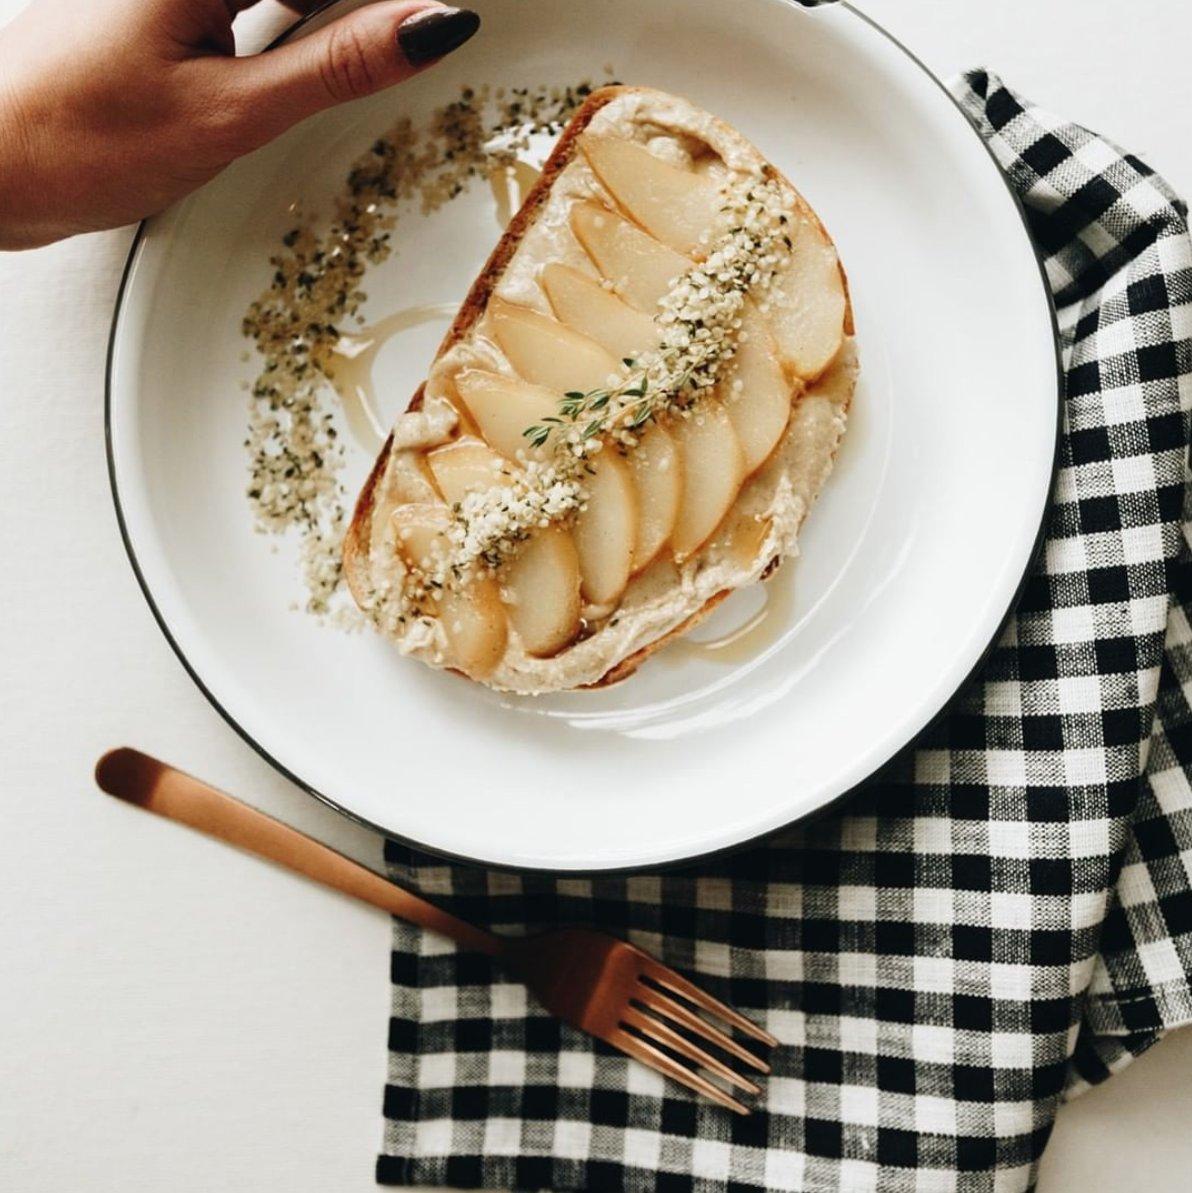 The greatest Friday setup... pear toast from @newgeneralstore #falconenamelware #fridayfuel #breakfastclub #breakfastgoalspic.twitter.com/Ot61xwht7v